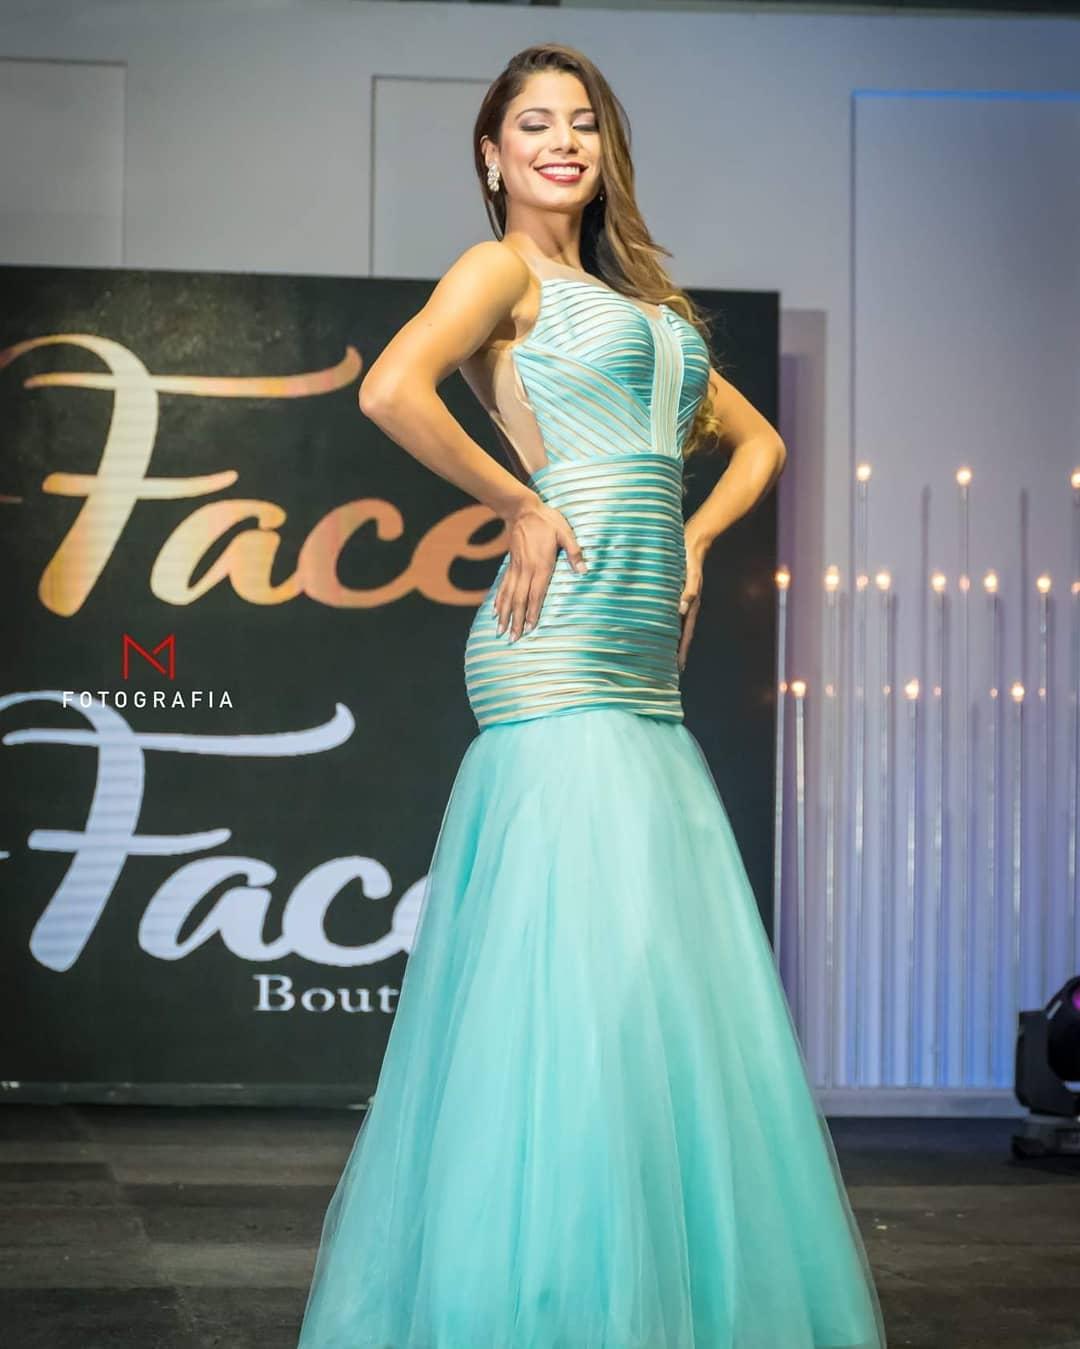 geraldine chaparro, miss usa hispanoamericana 2018/miss mundo latina turismo usa 2018. - Página 3 43915112